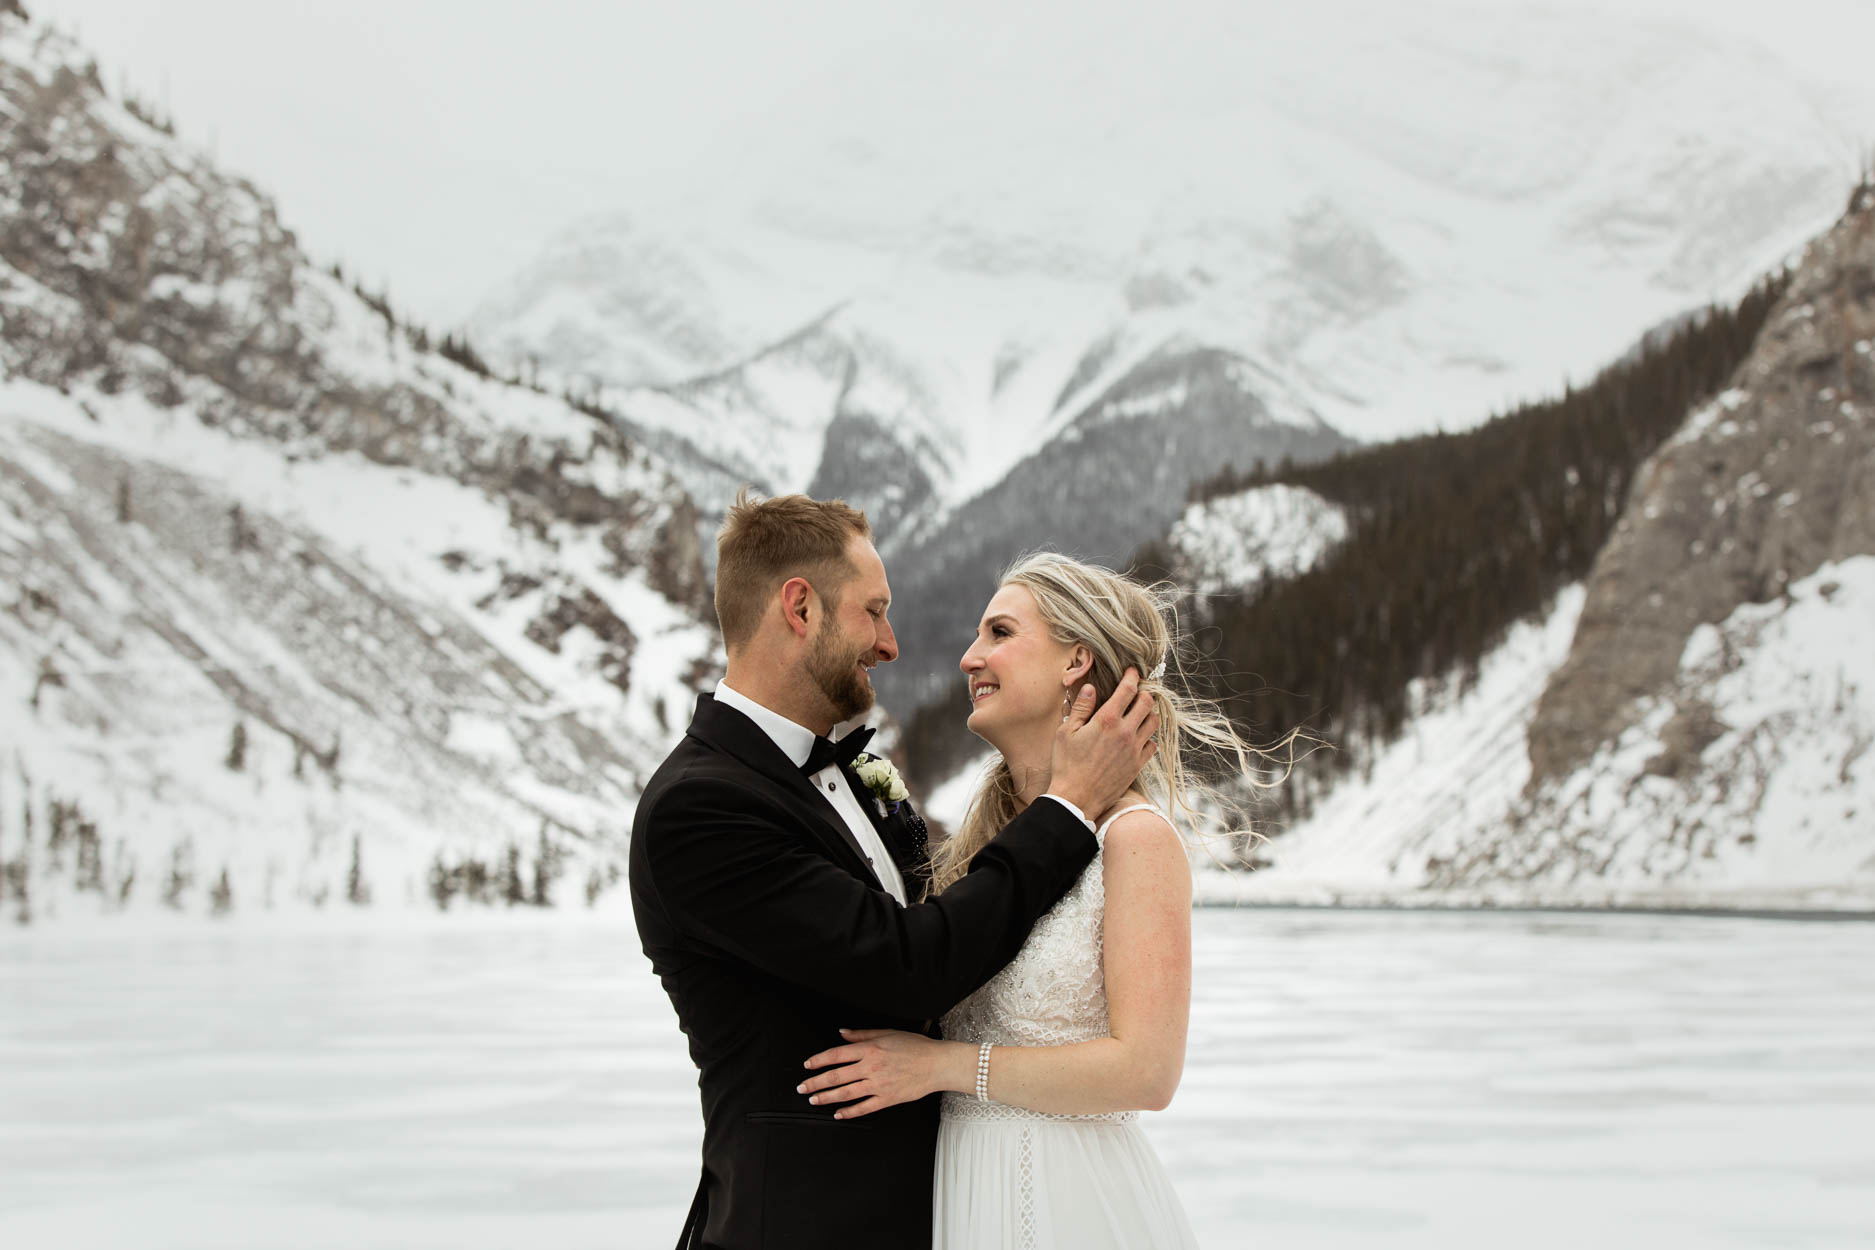 Canmore Winter Wedding Photographer